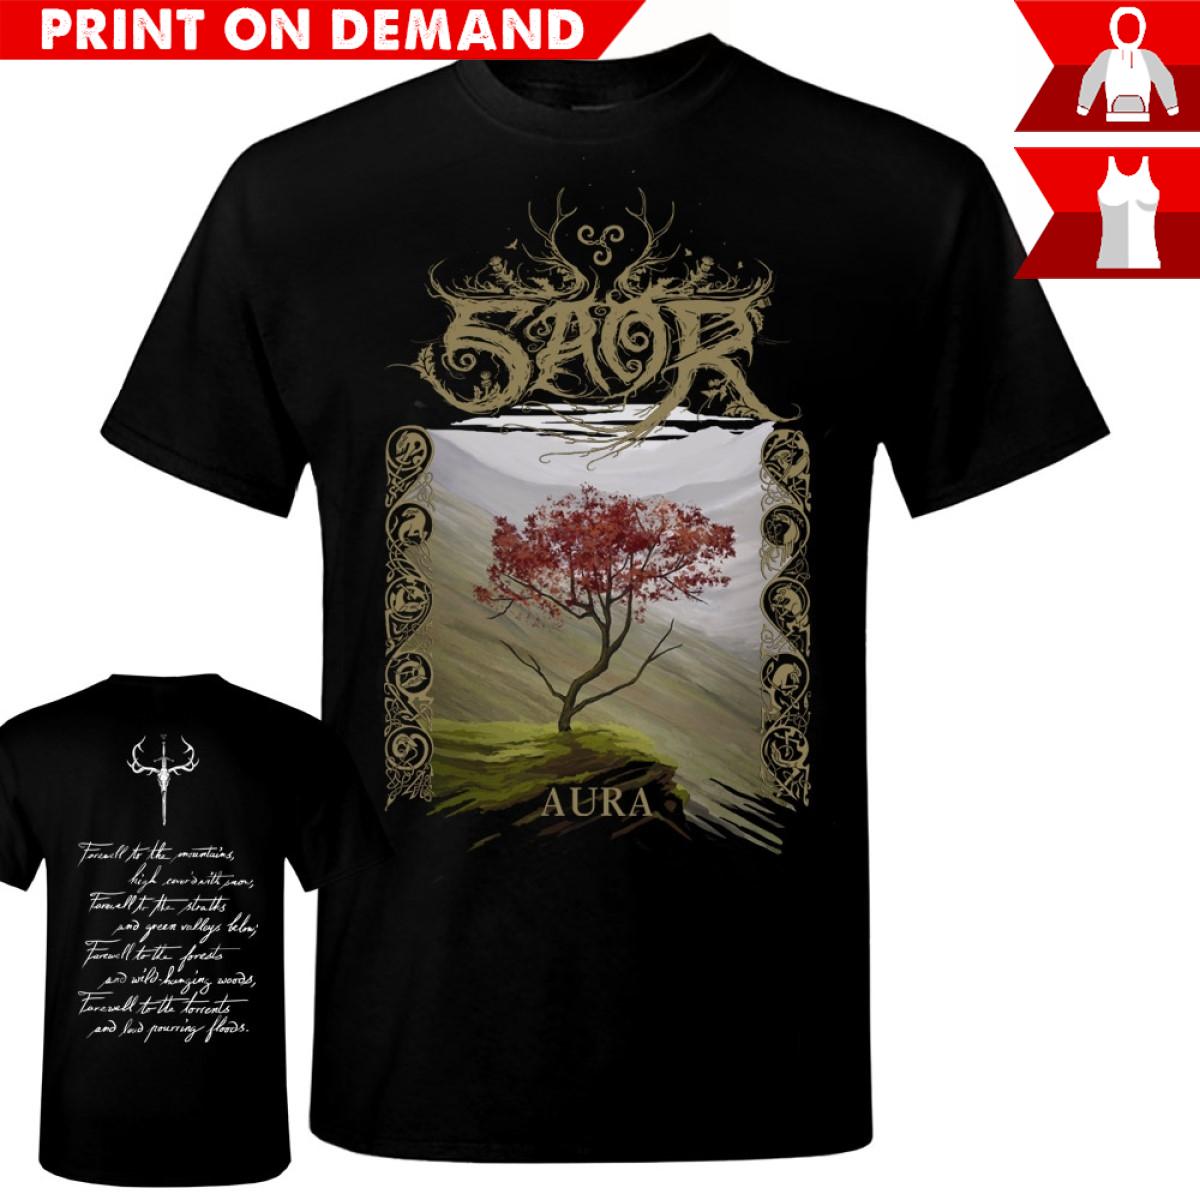 Aura - Print on demand